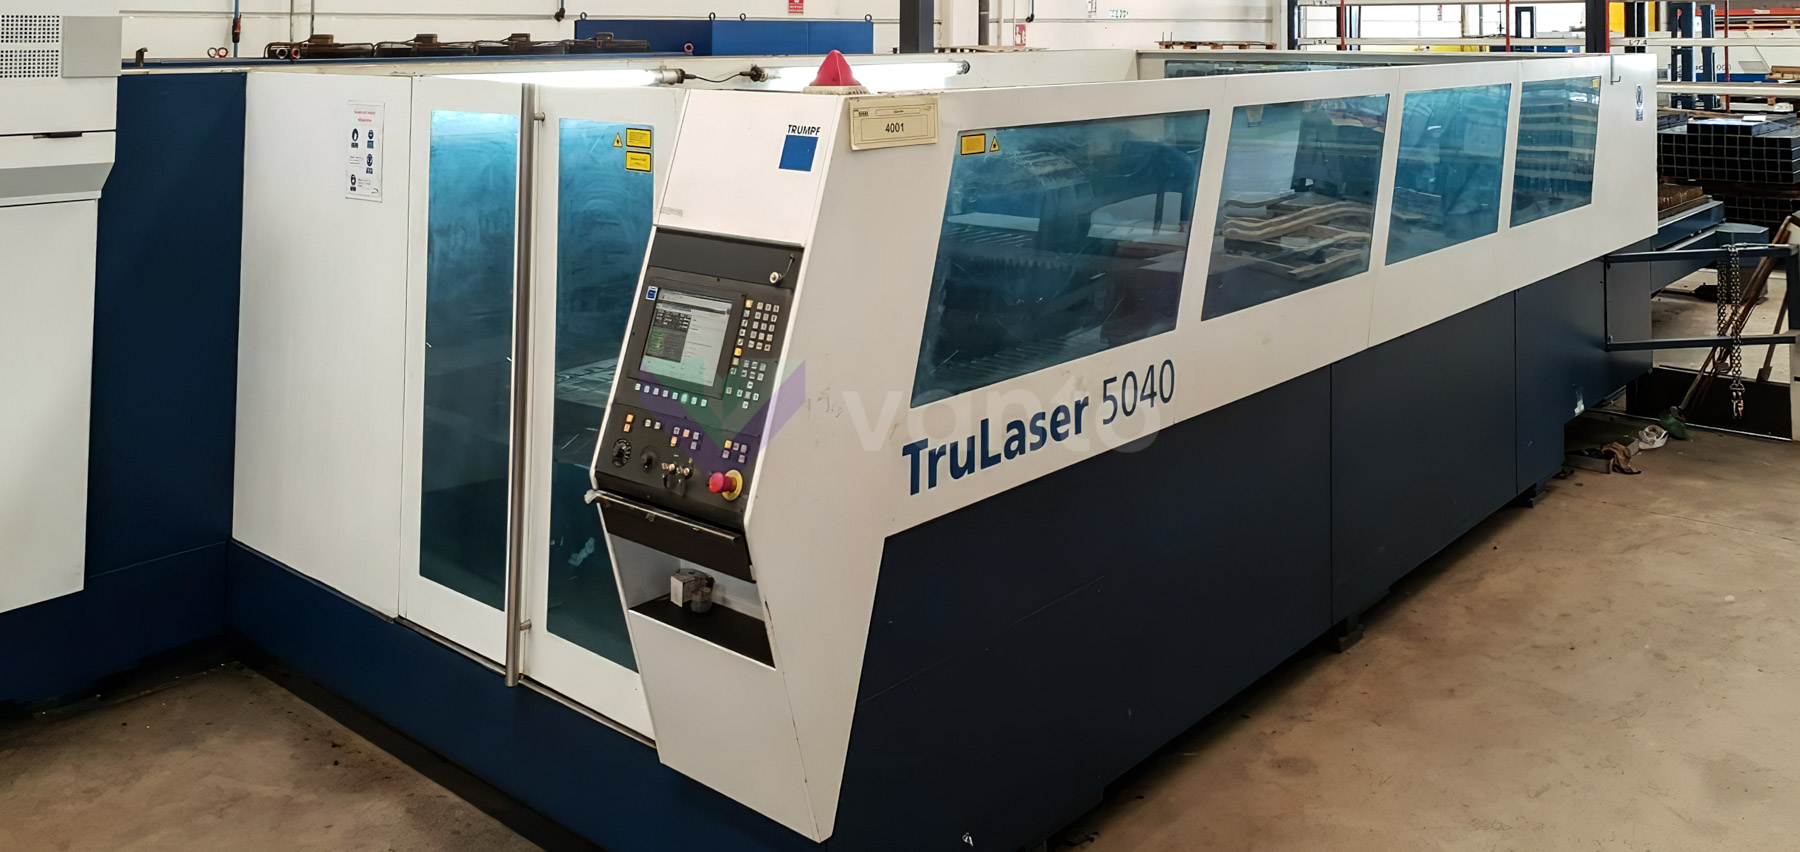 TRUMPF TruLaser 5040 Laser cutting machine (CO2) (2008) id10397